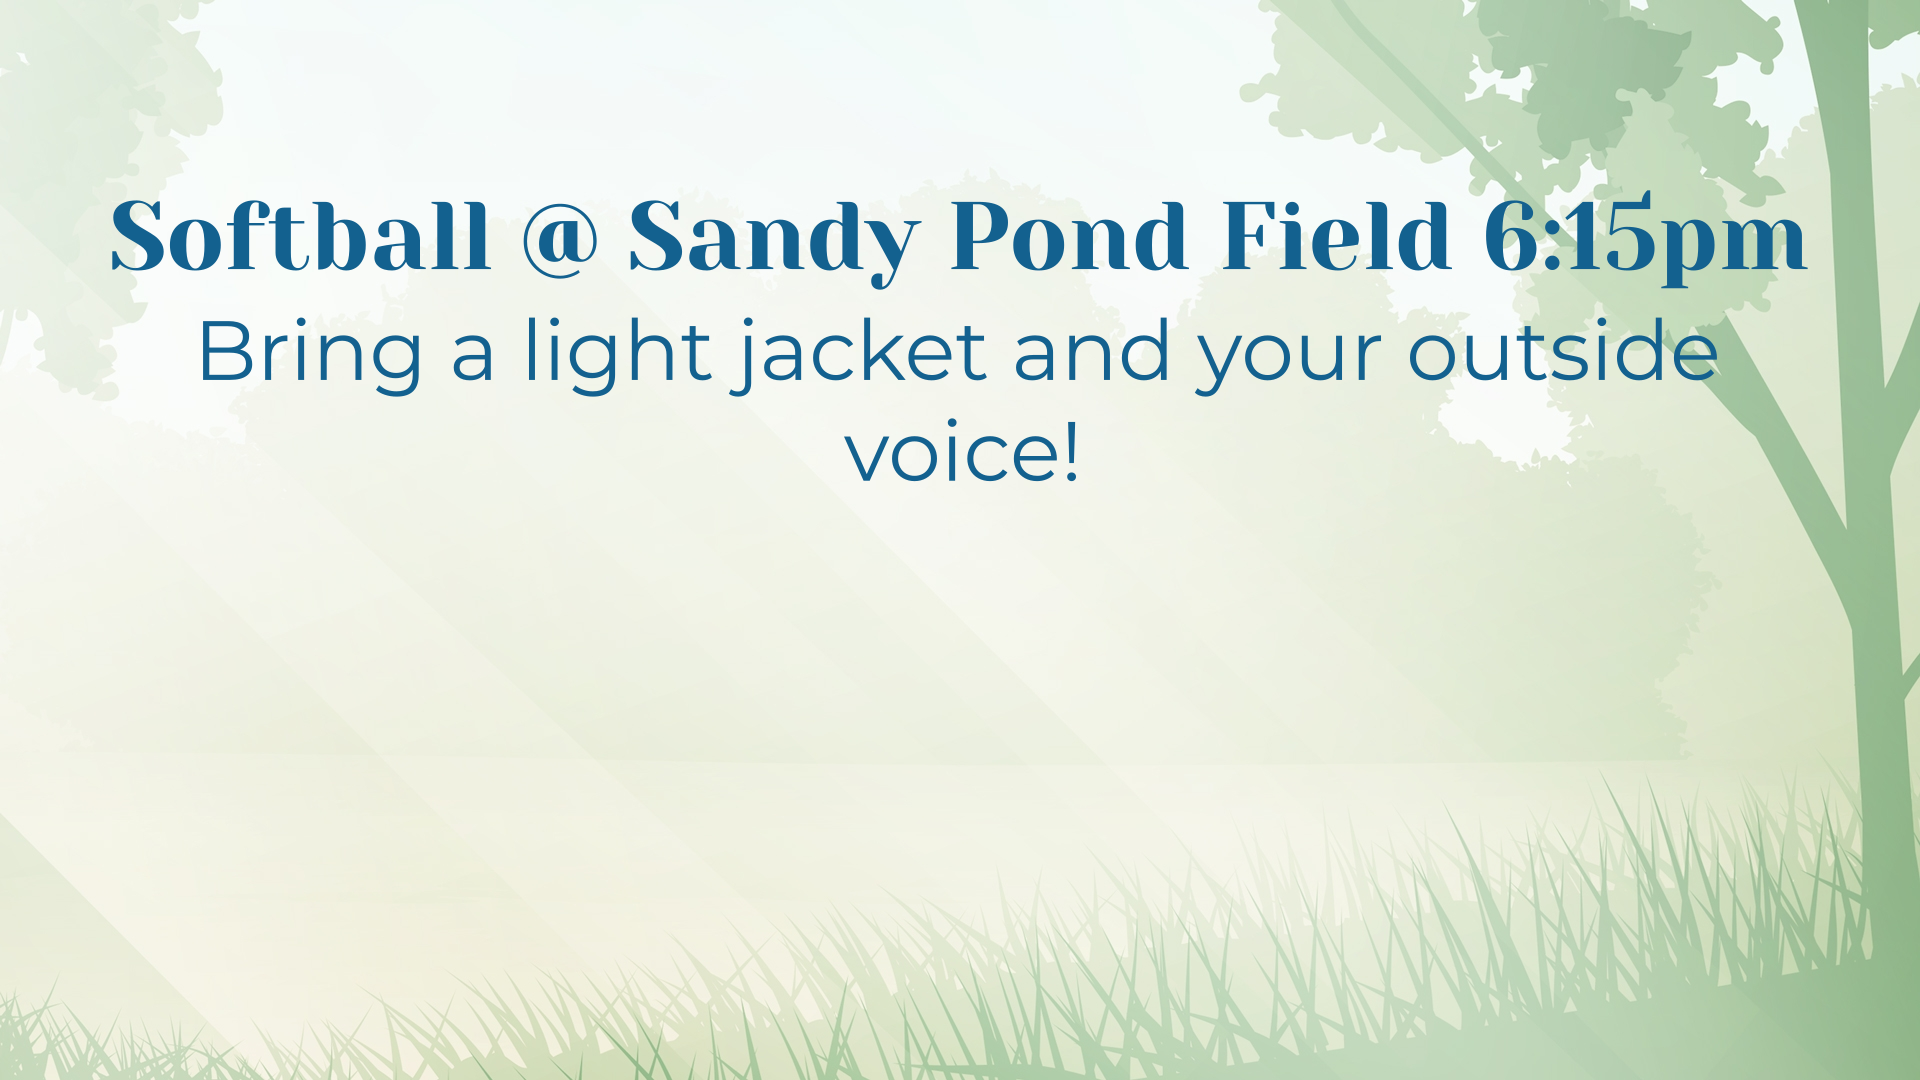 Softball @ Sandy Pond Field 6:15pm